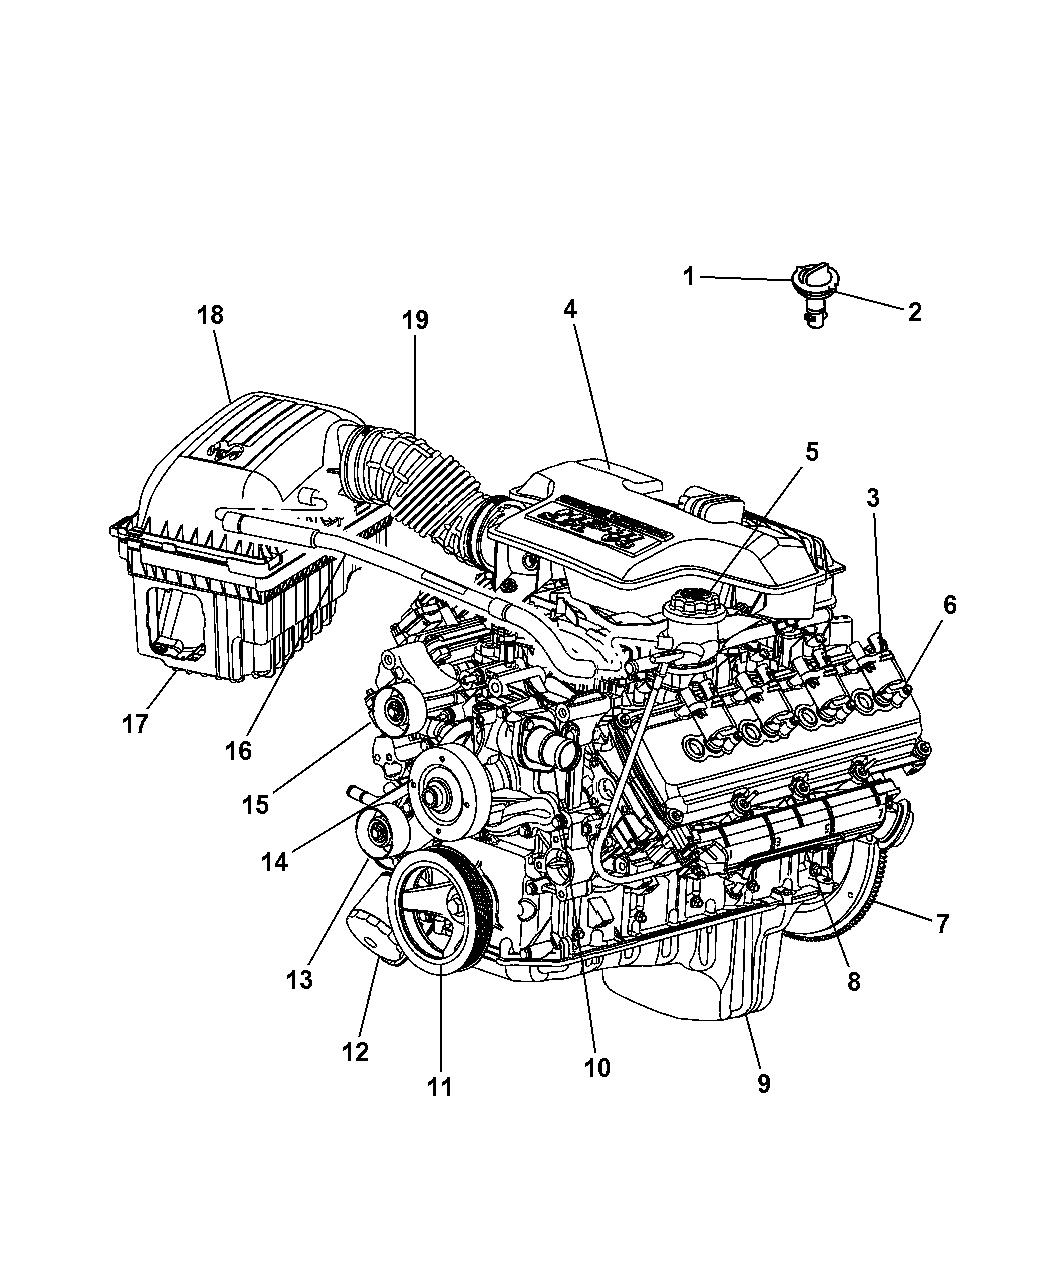 Dodge 4 7l Engine Diagram - wiring diagram diode-motor - diode-motor .bibidi-bobidi-bu.it